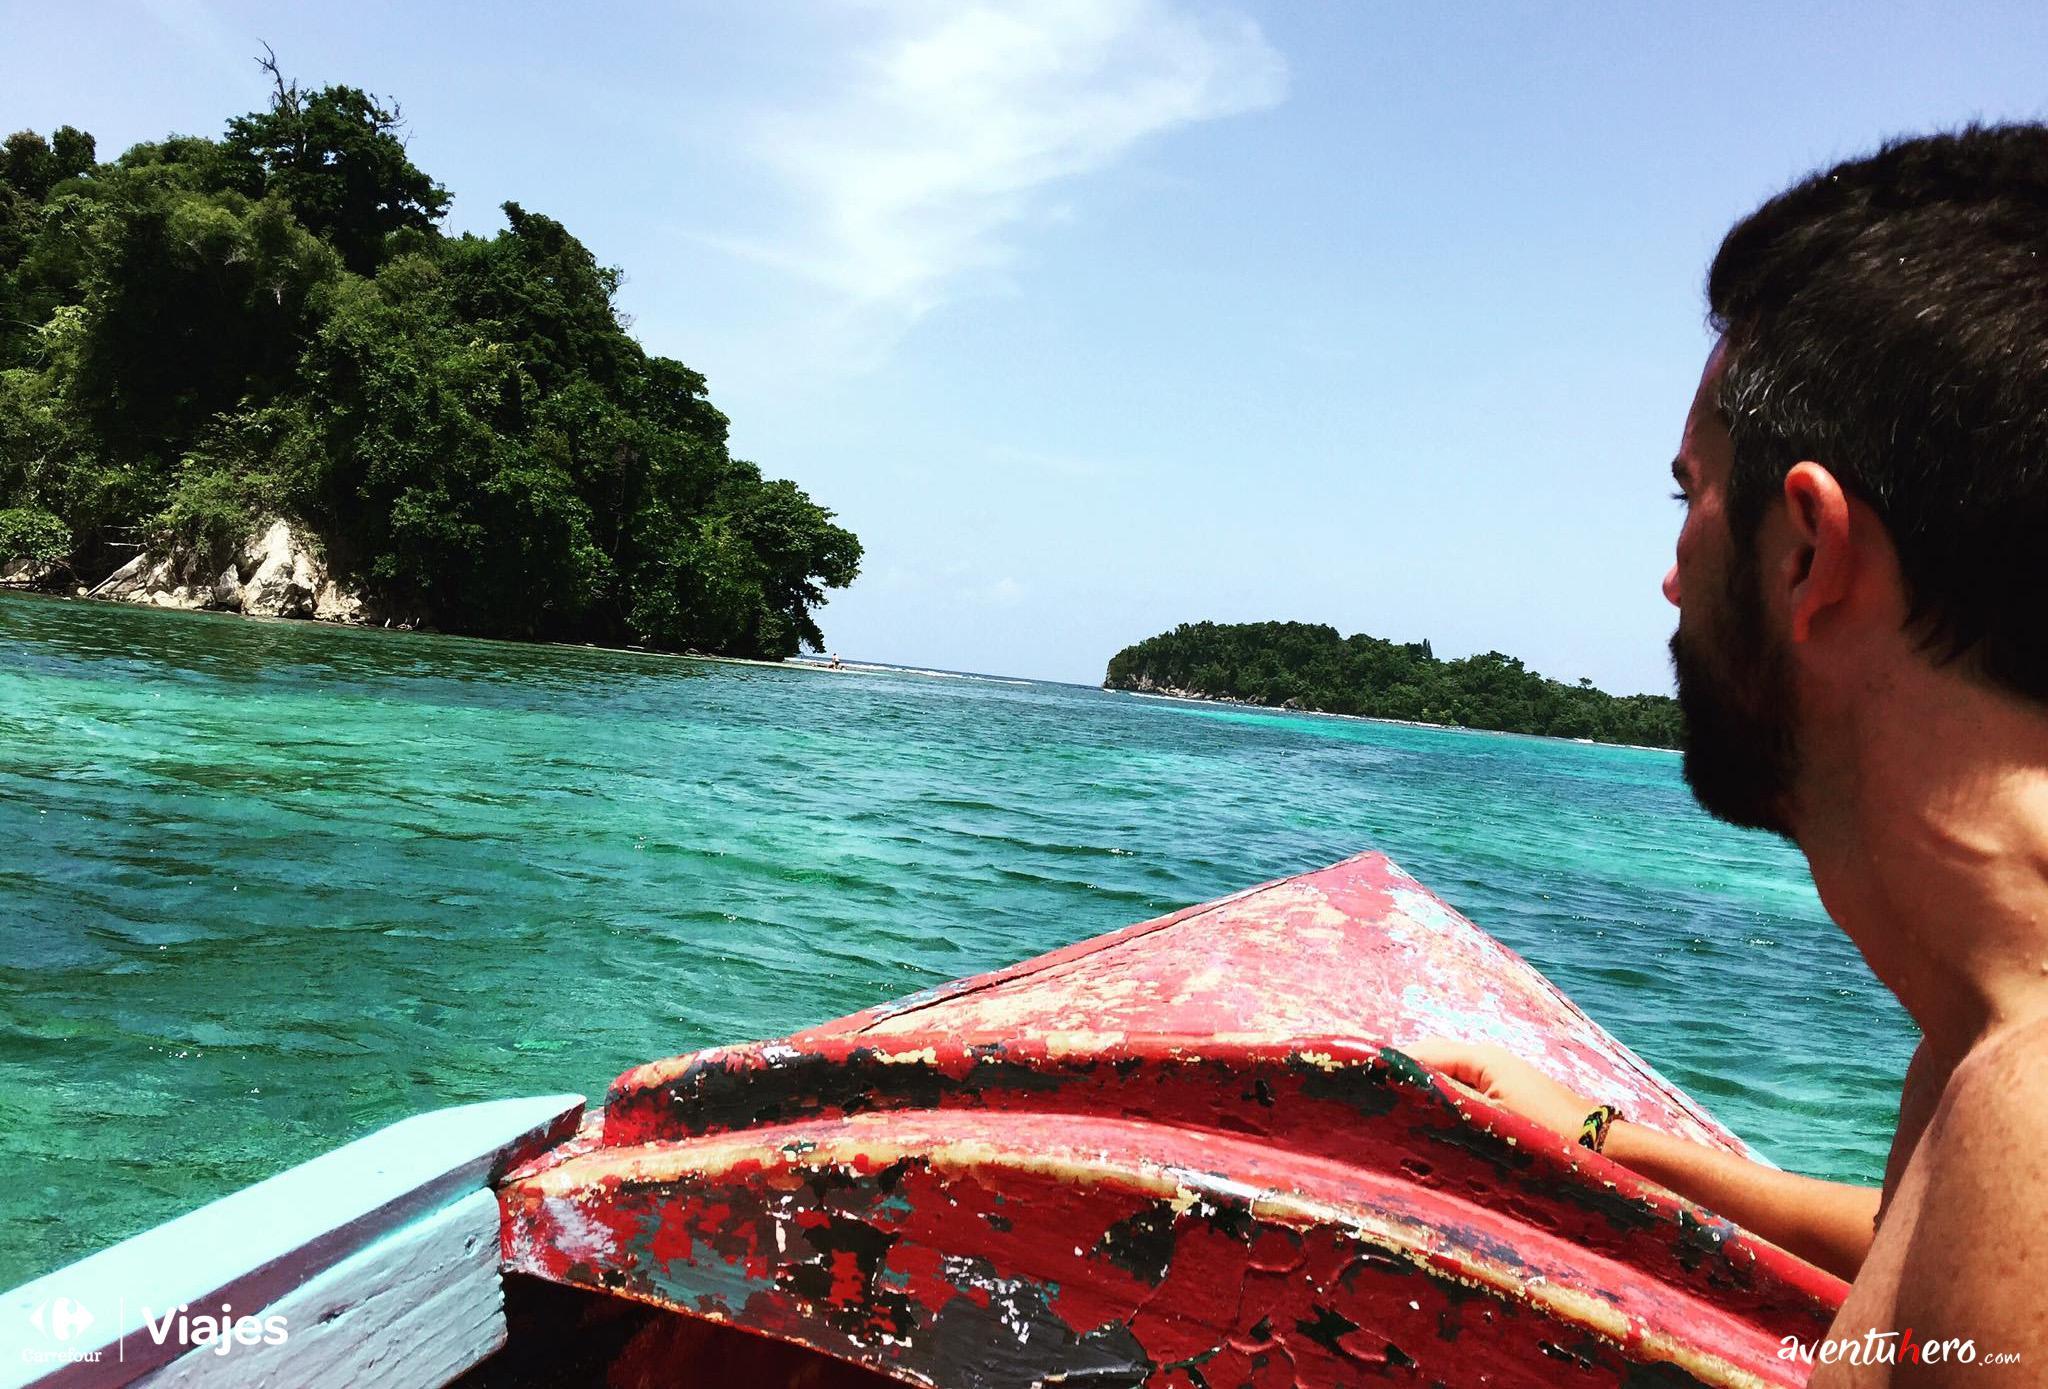 Aventuhero - Adentrandonos en Monkey Island. Jamaica